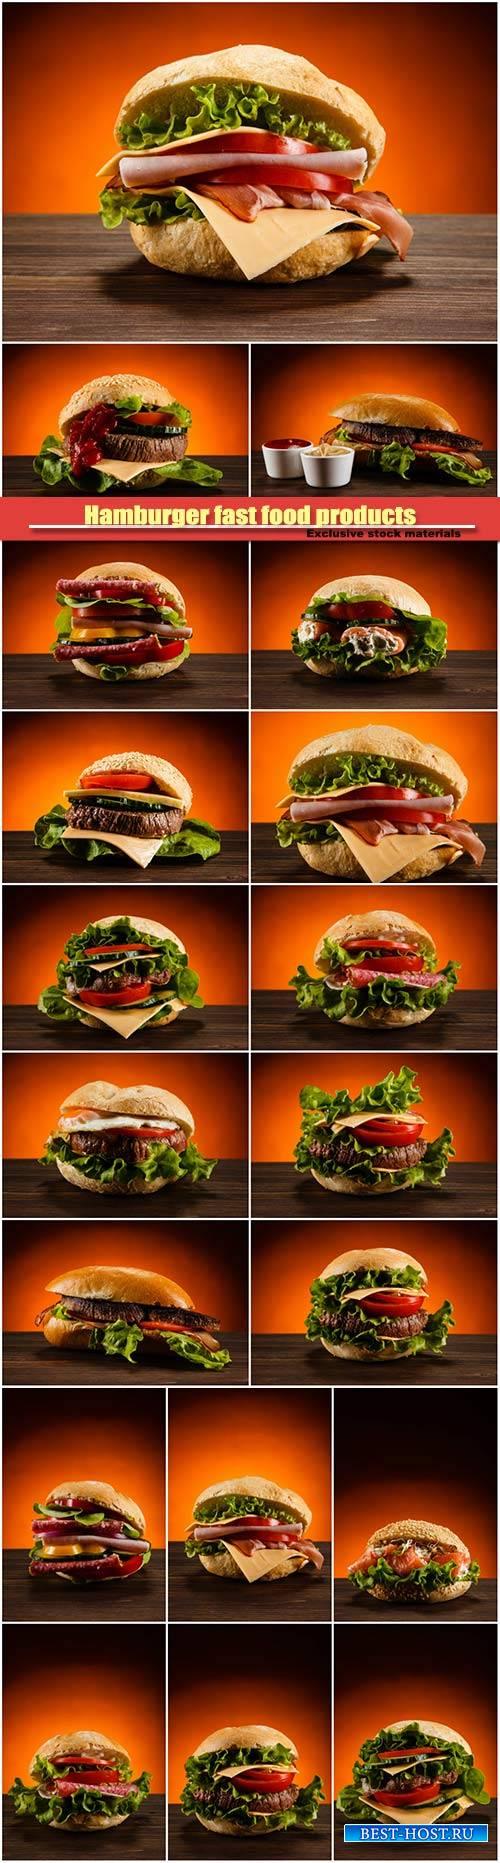 Hamburger fast food products